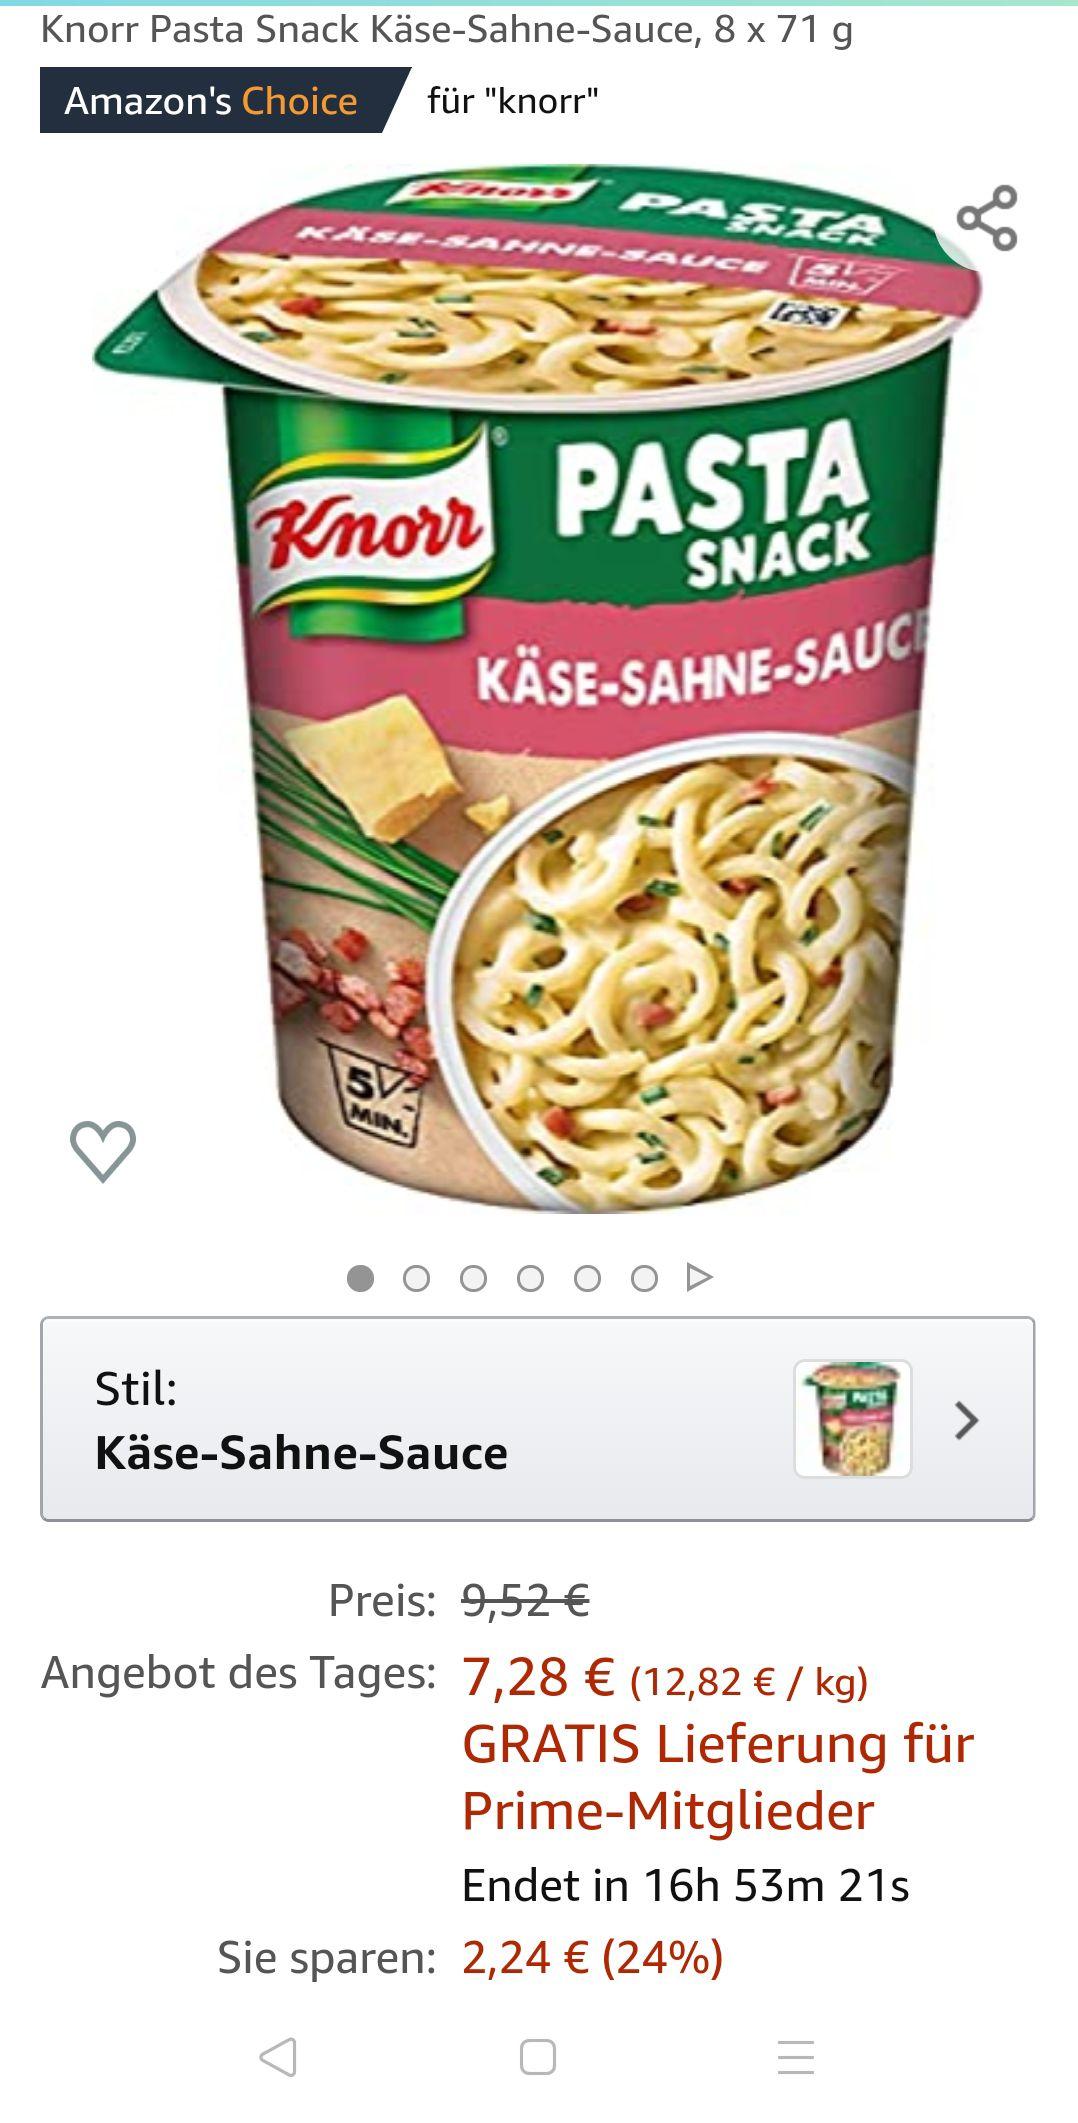 Knorr Pasta Snack Käse-Sahne-Sauce, 8x71g